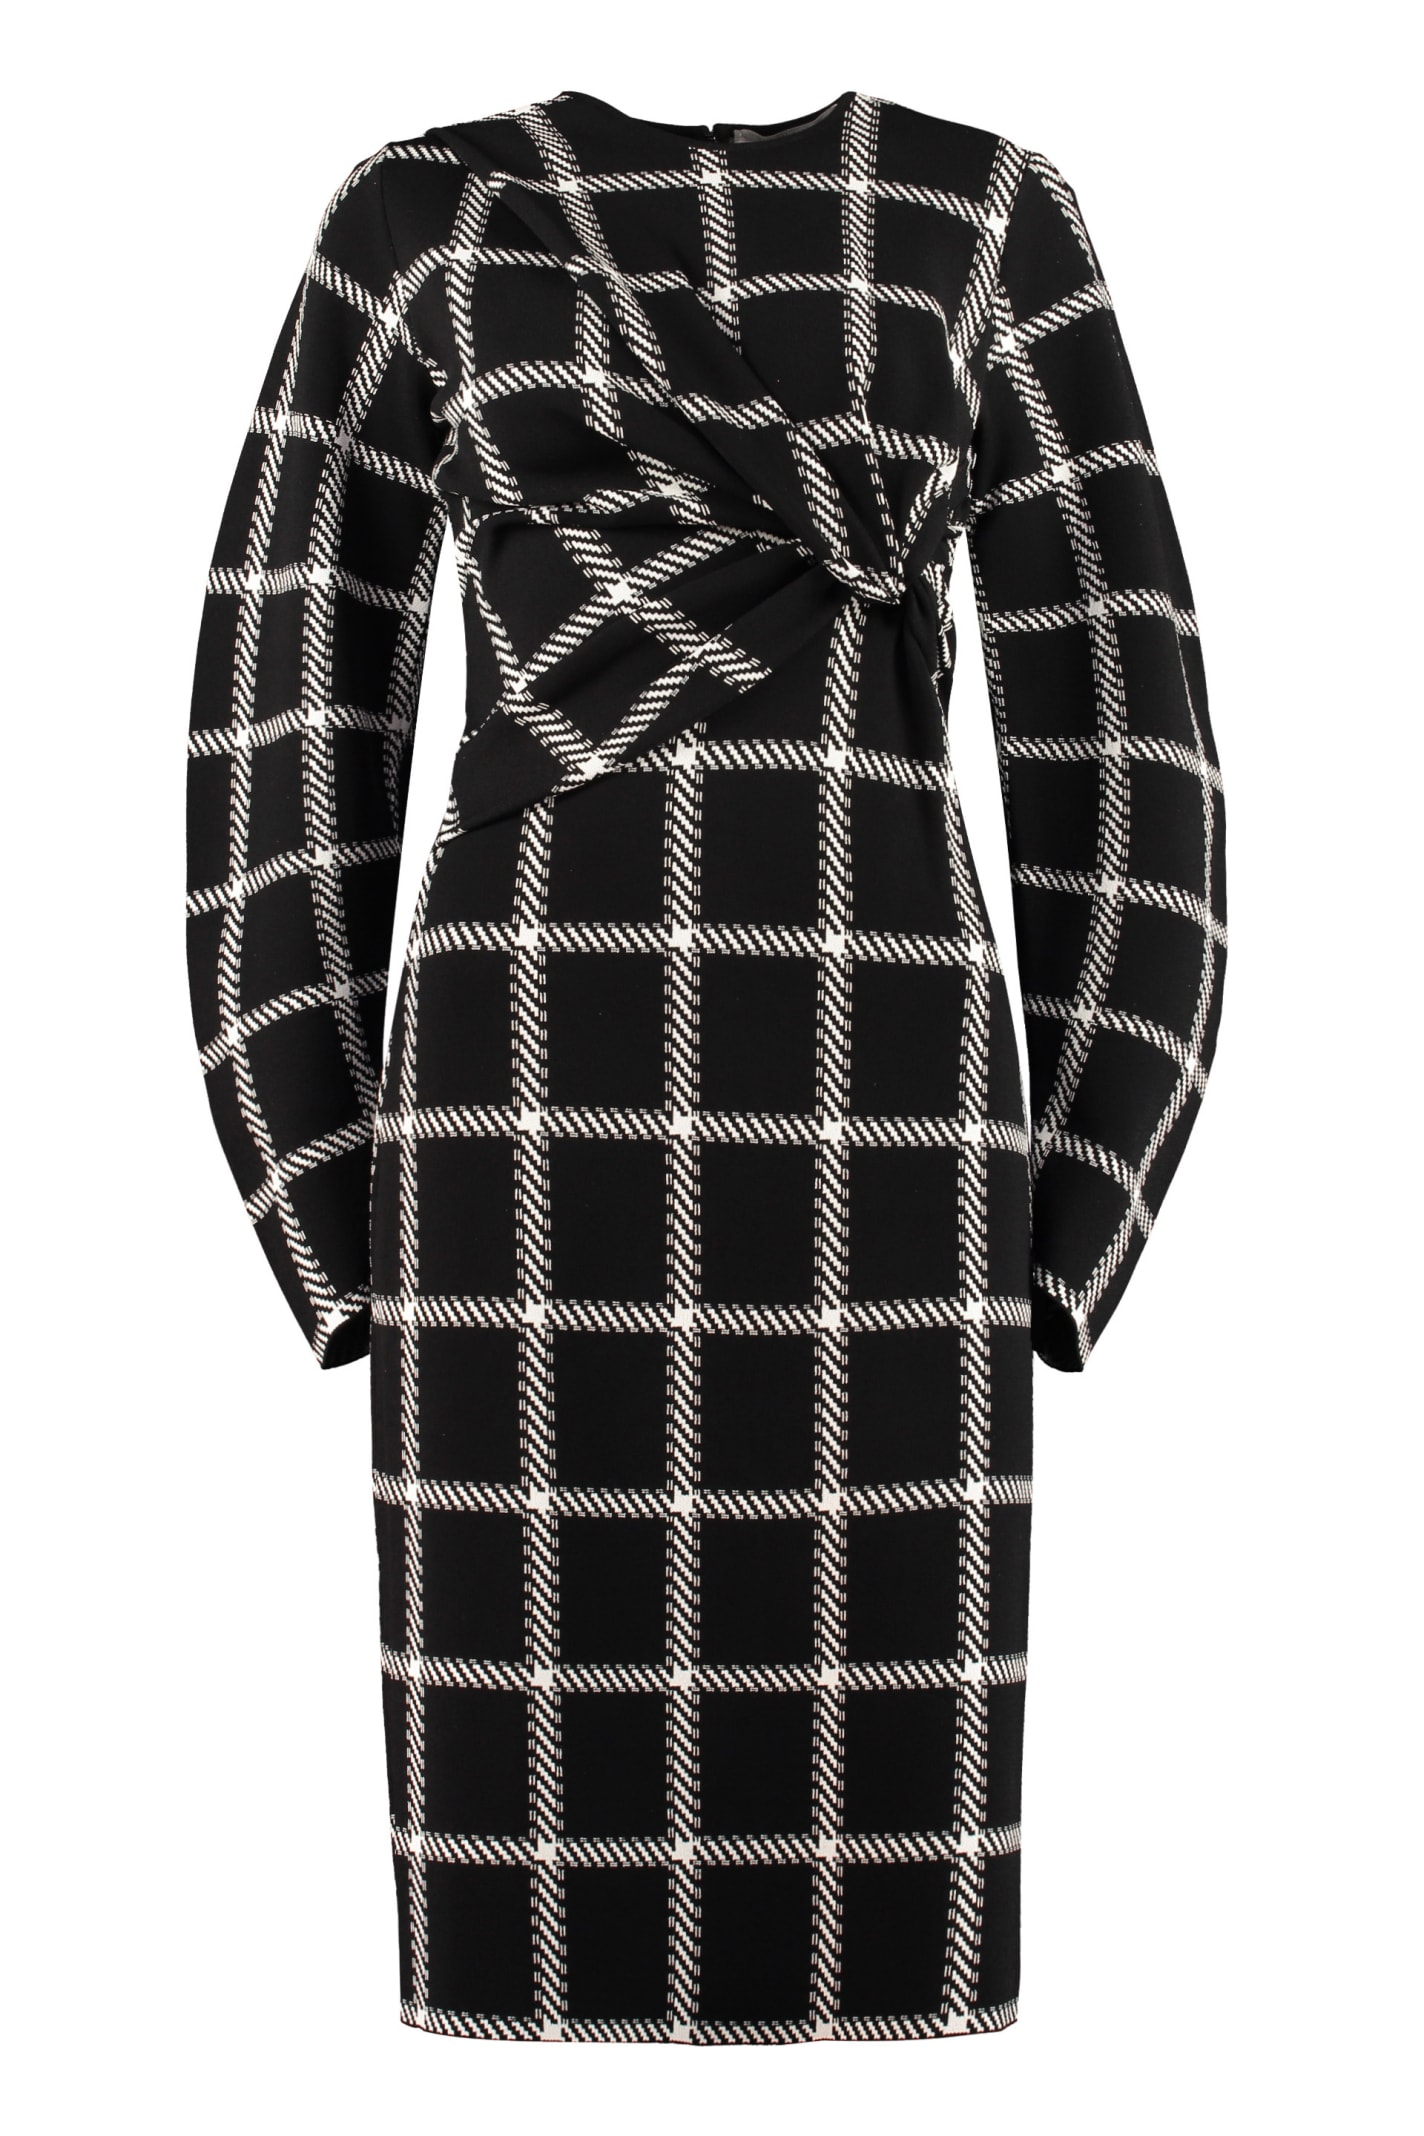 Stella McCartney Checked Knitdress